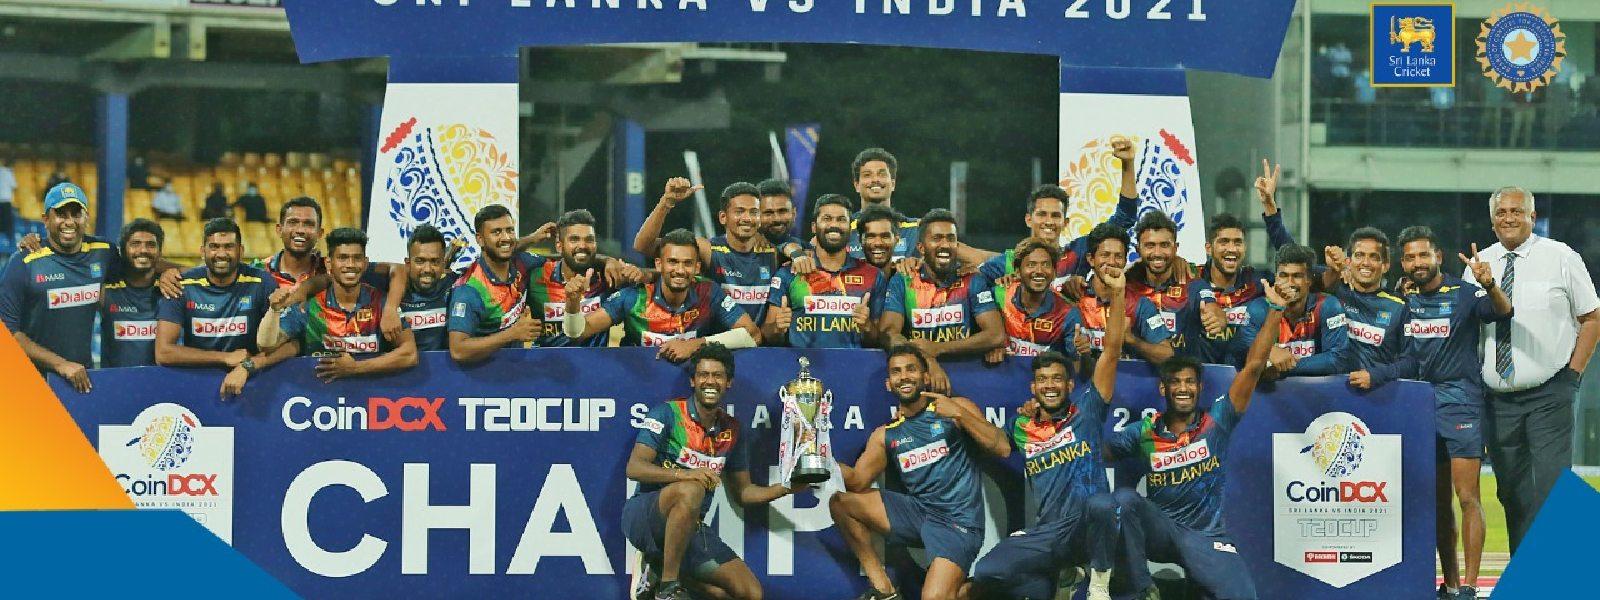 Sri Lanka Beat India By 7 Wickets, Win Series 2-1